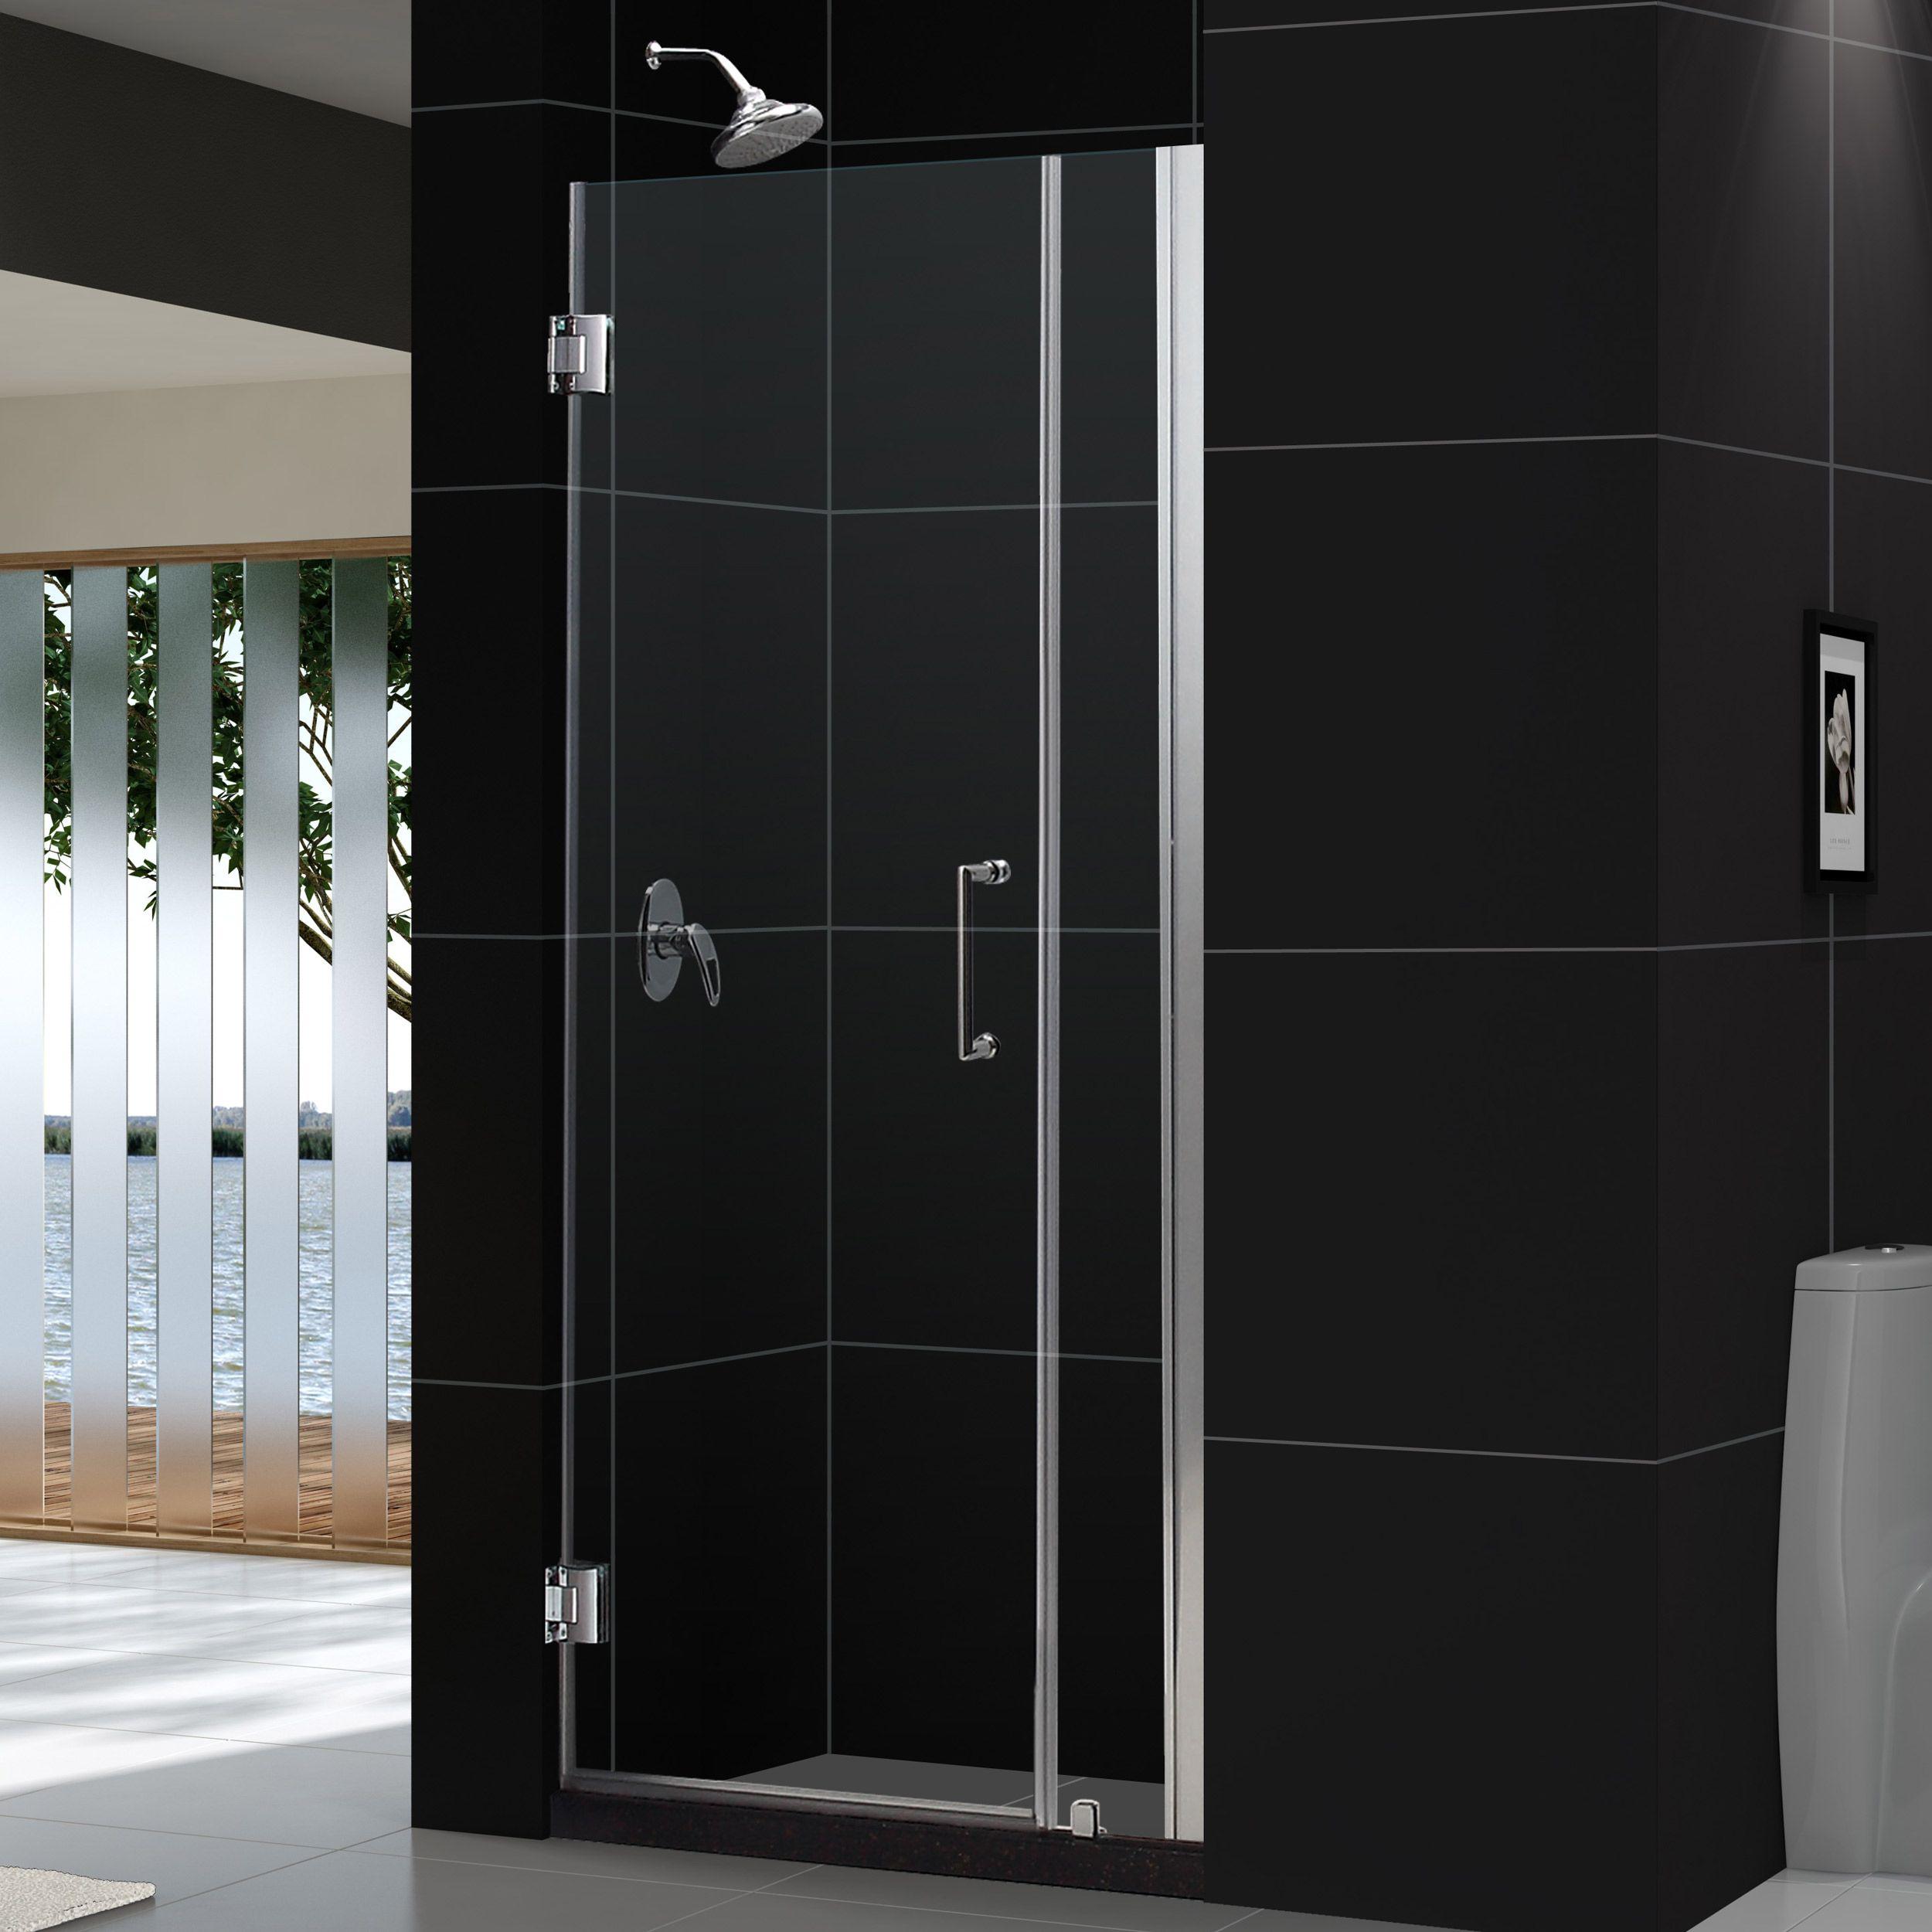 Dreamline Unidoor 33 34 In W X 72 In H Frameless Hinged Shower